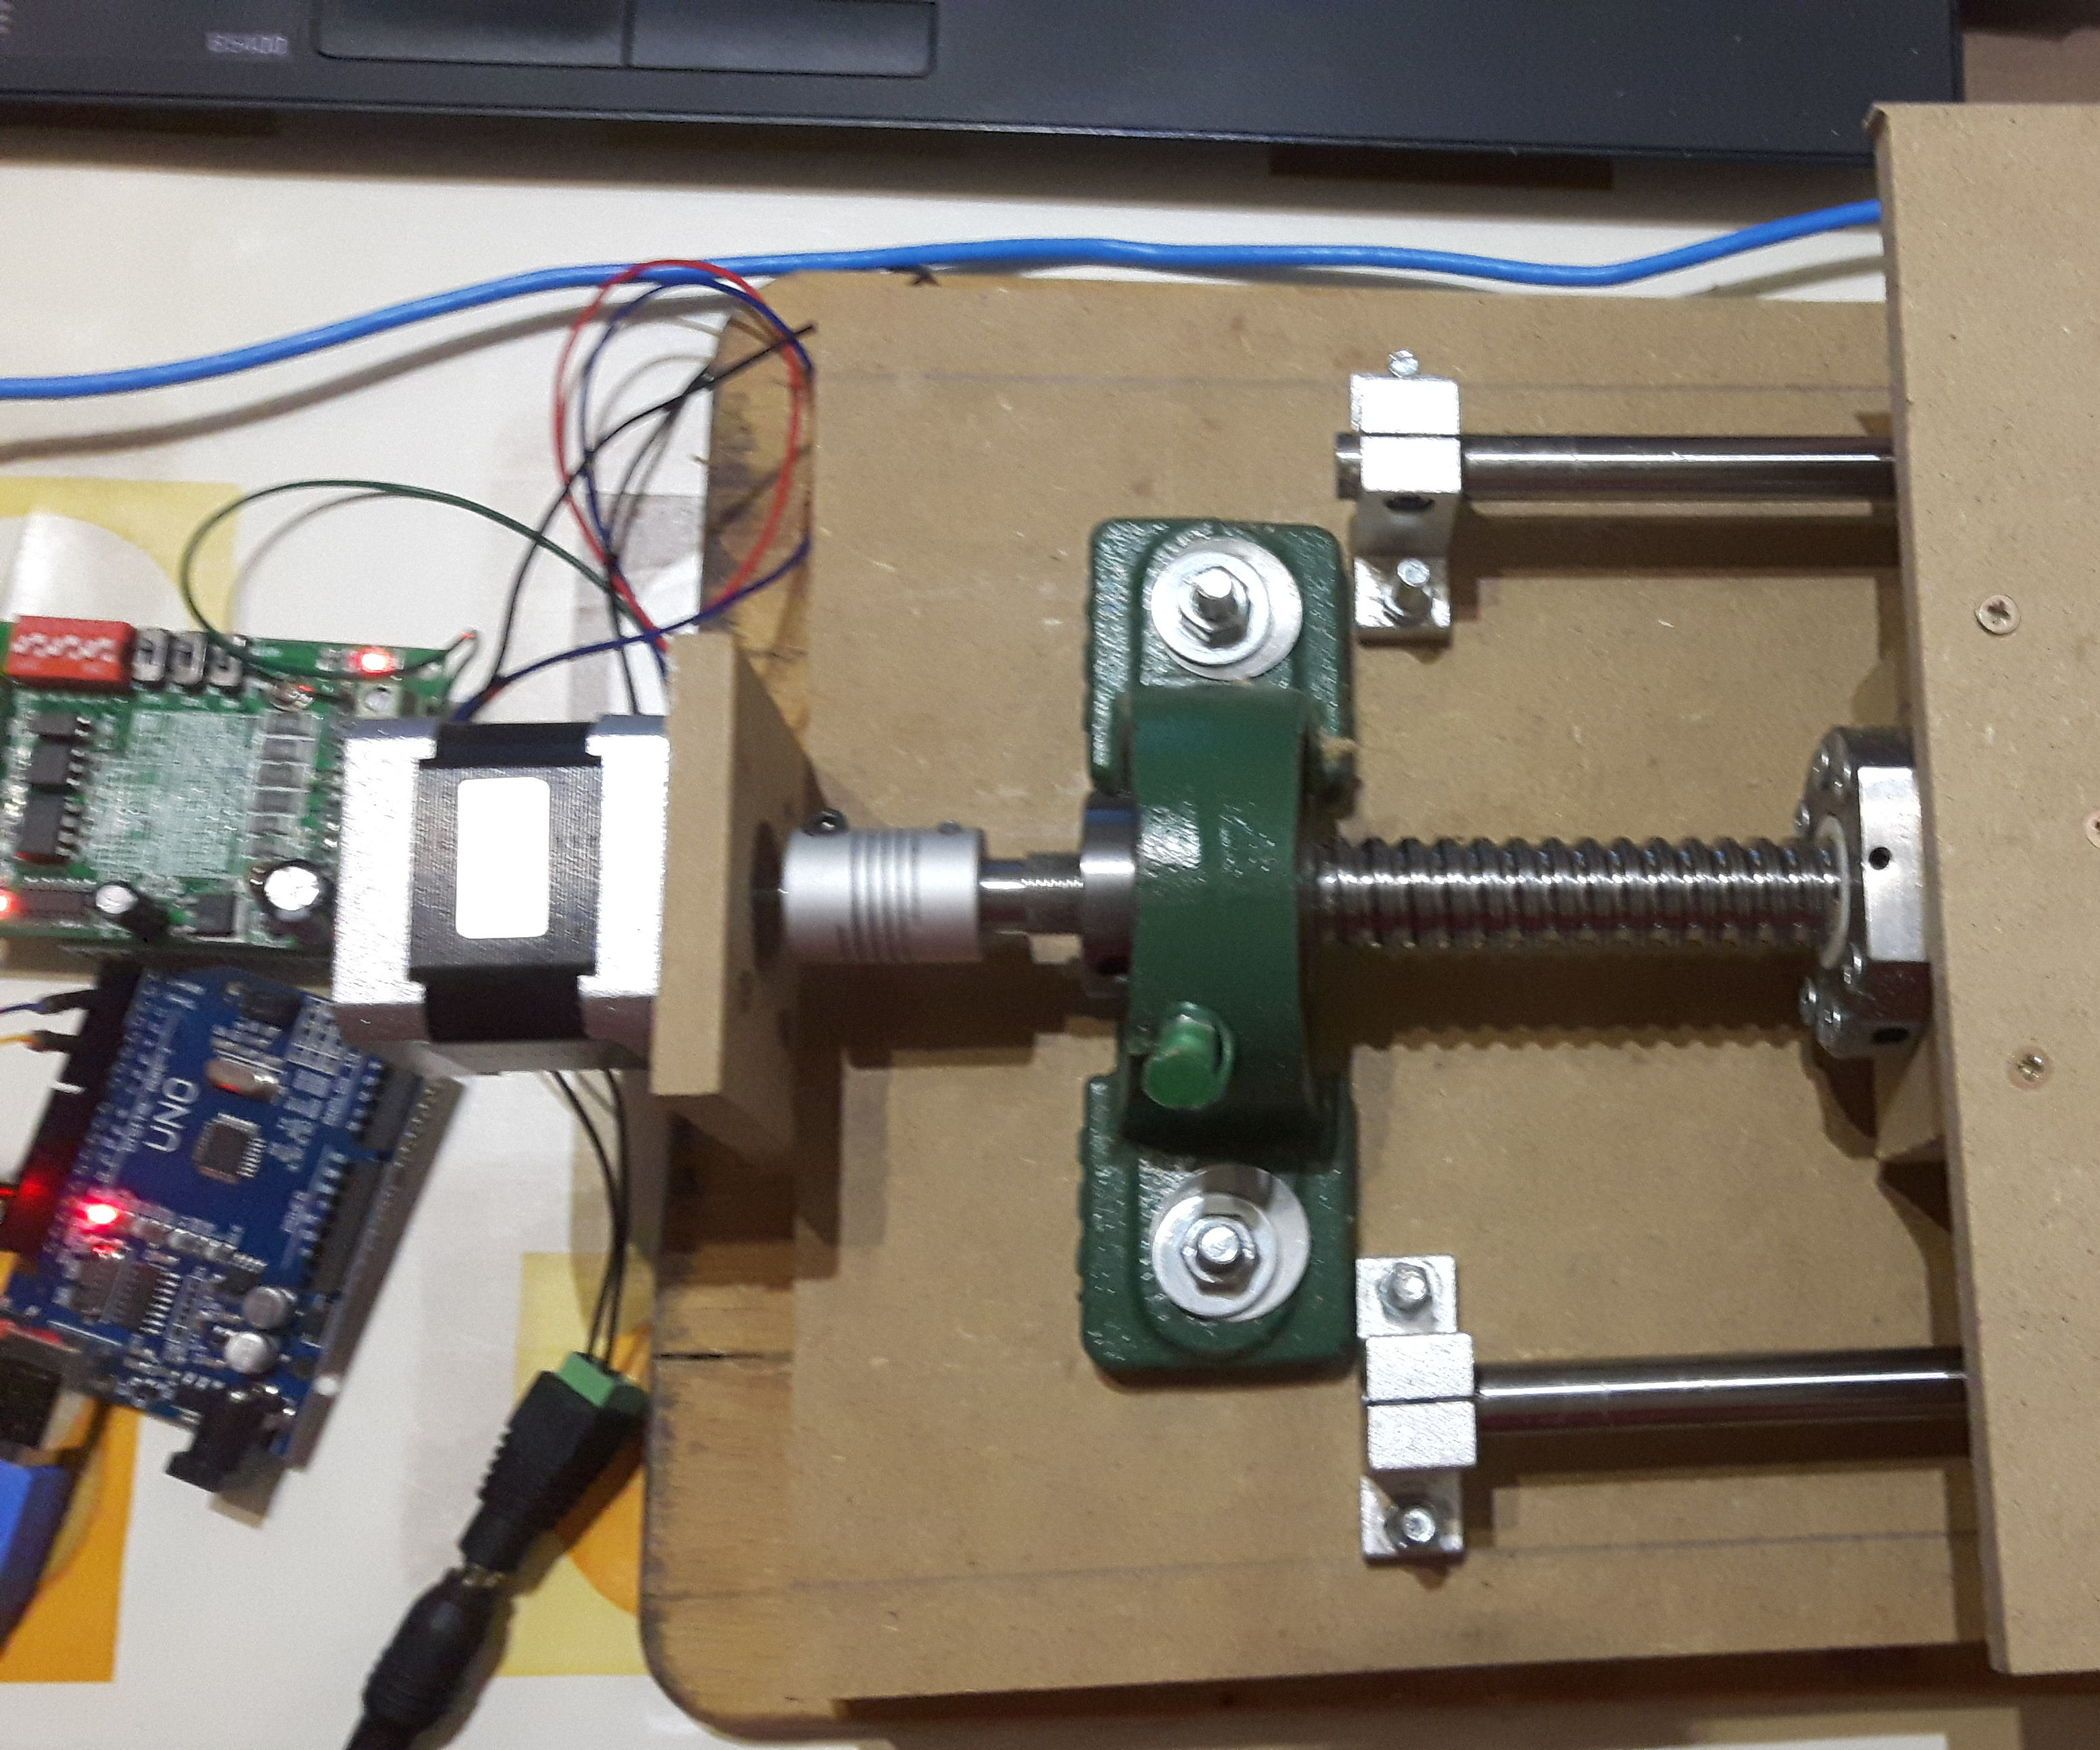 Homemade Cnc Milling Machine V2 Arduino Uno Grbl